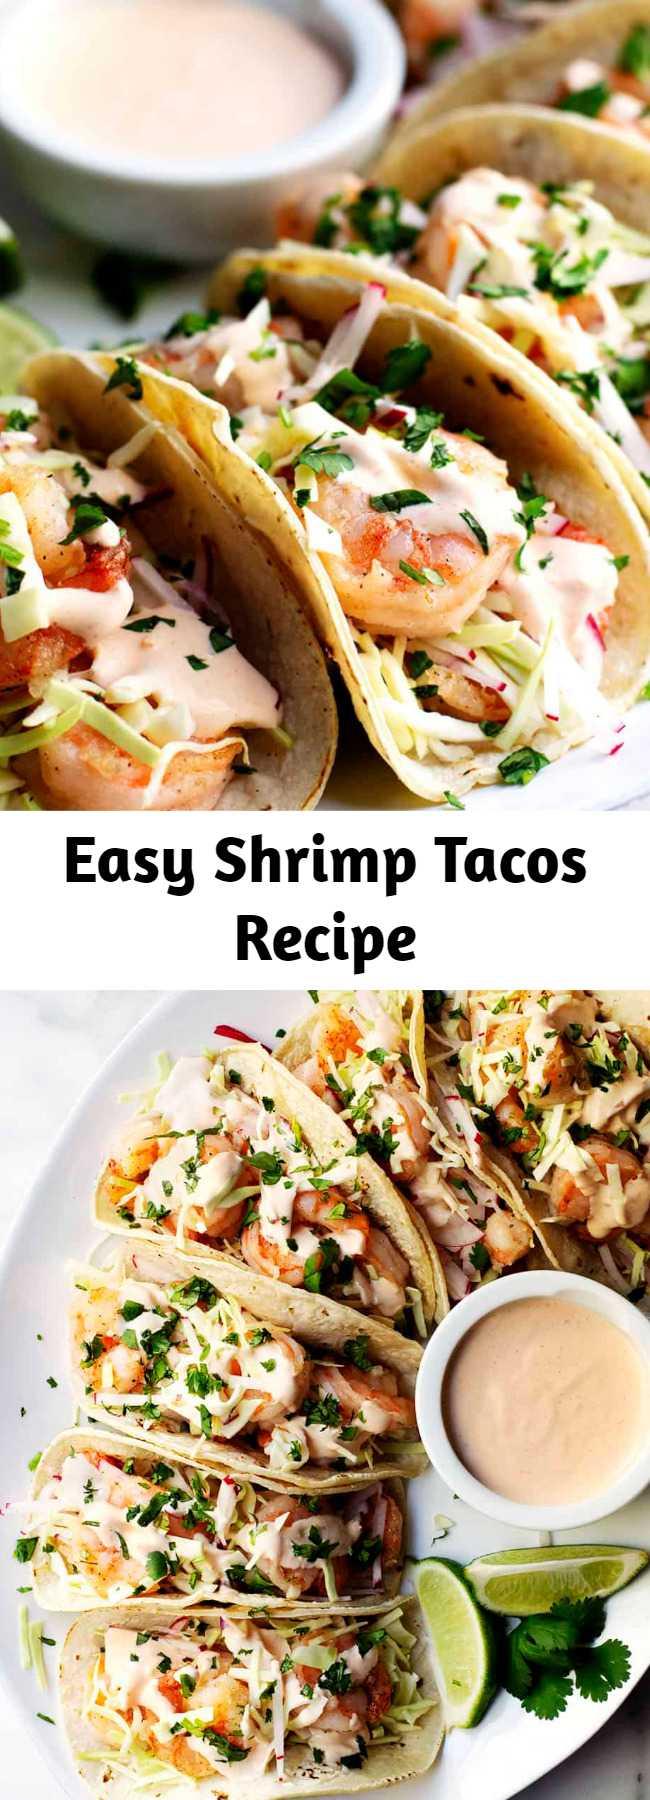 Easy Shrimp Tacos Recipe - Easy and Healthy Shrimp Tacos with lightly charred tortillas, crisp salt and pepper coated shrimp, crunchy slaw and spicy, creamy shrimp taco sauce! #shrimptacos #easyshrimptacos #shrimptacoswithcabbageslaw